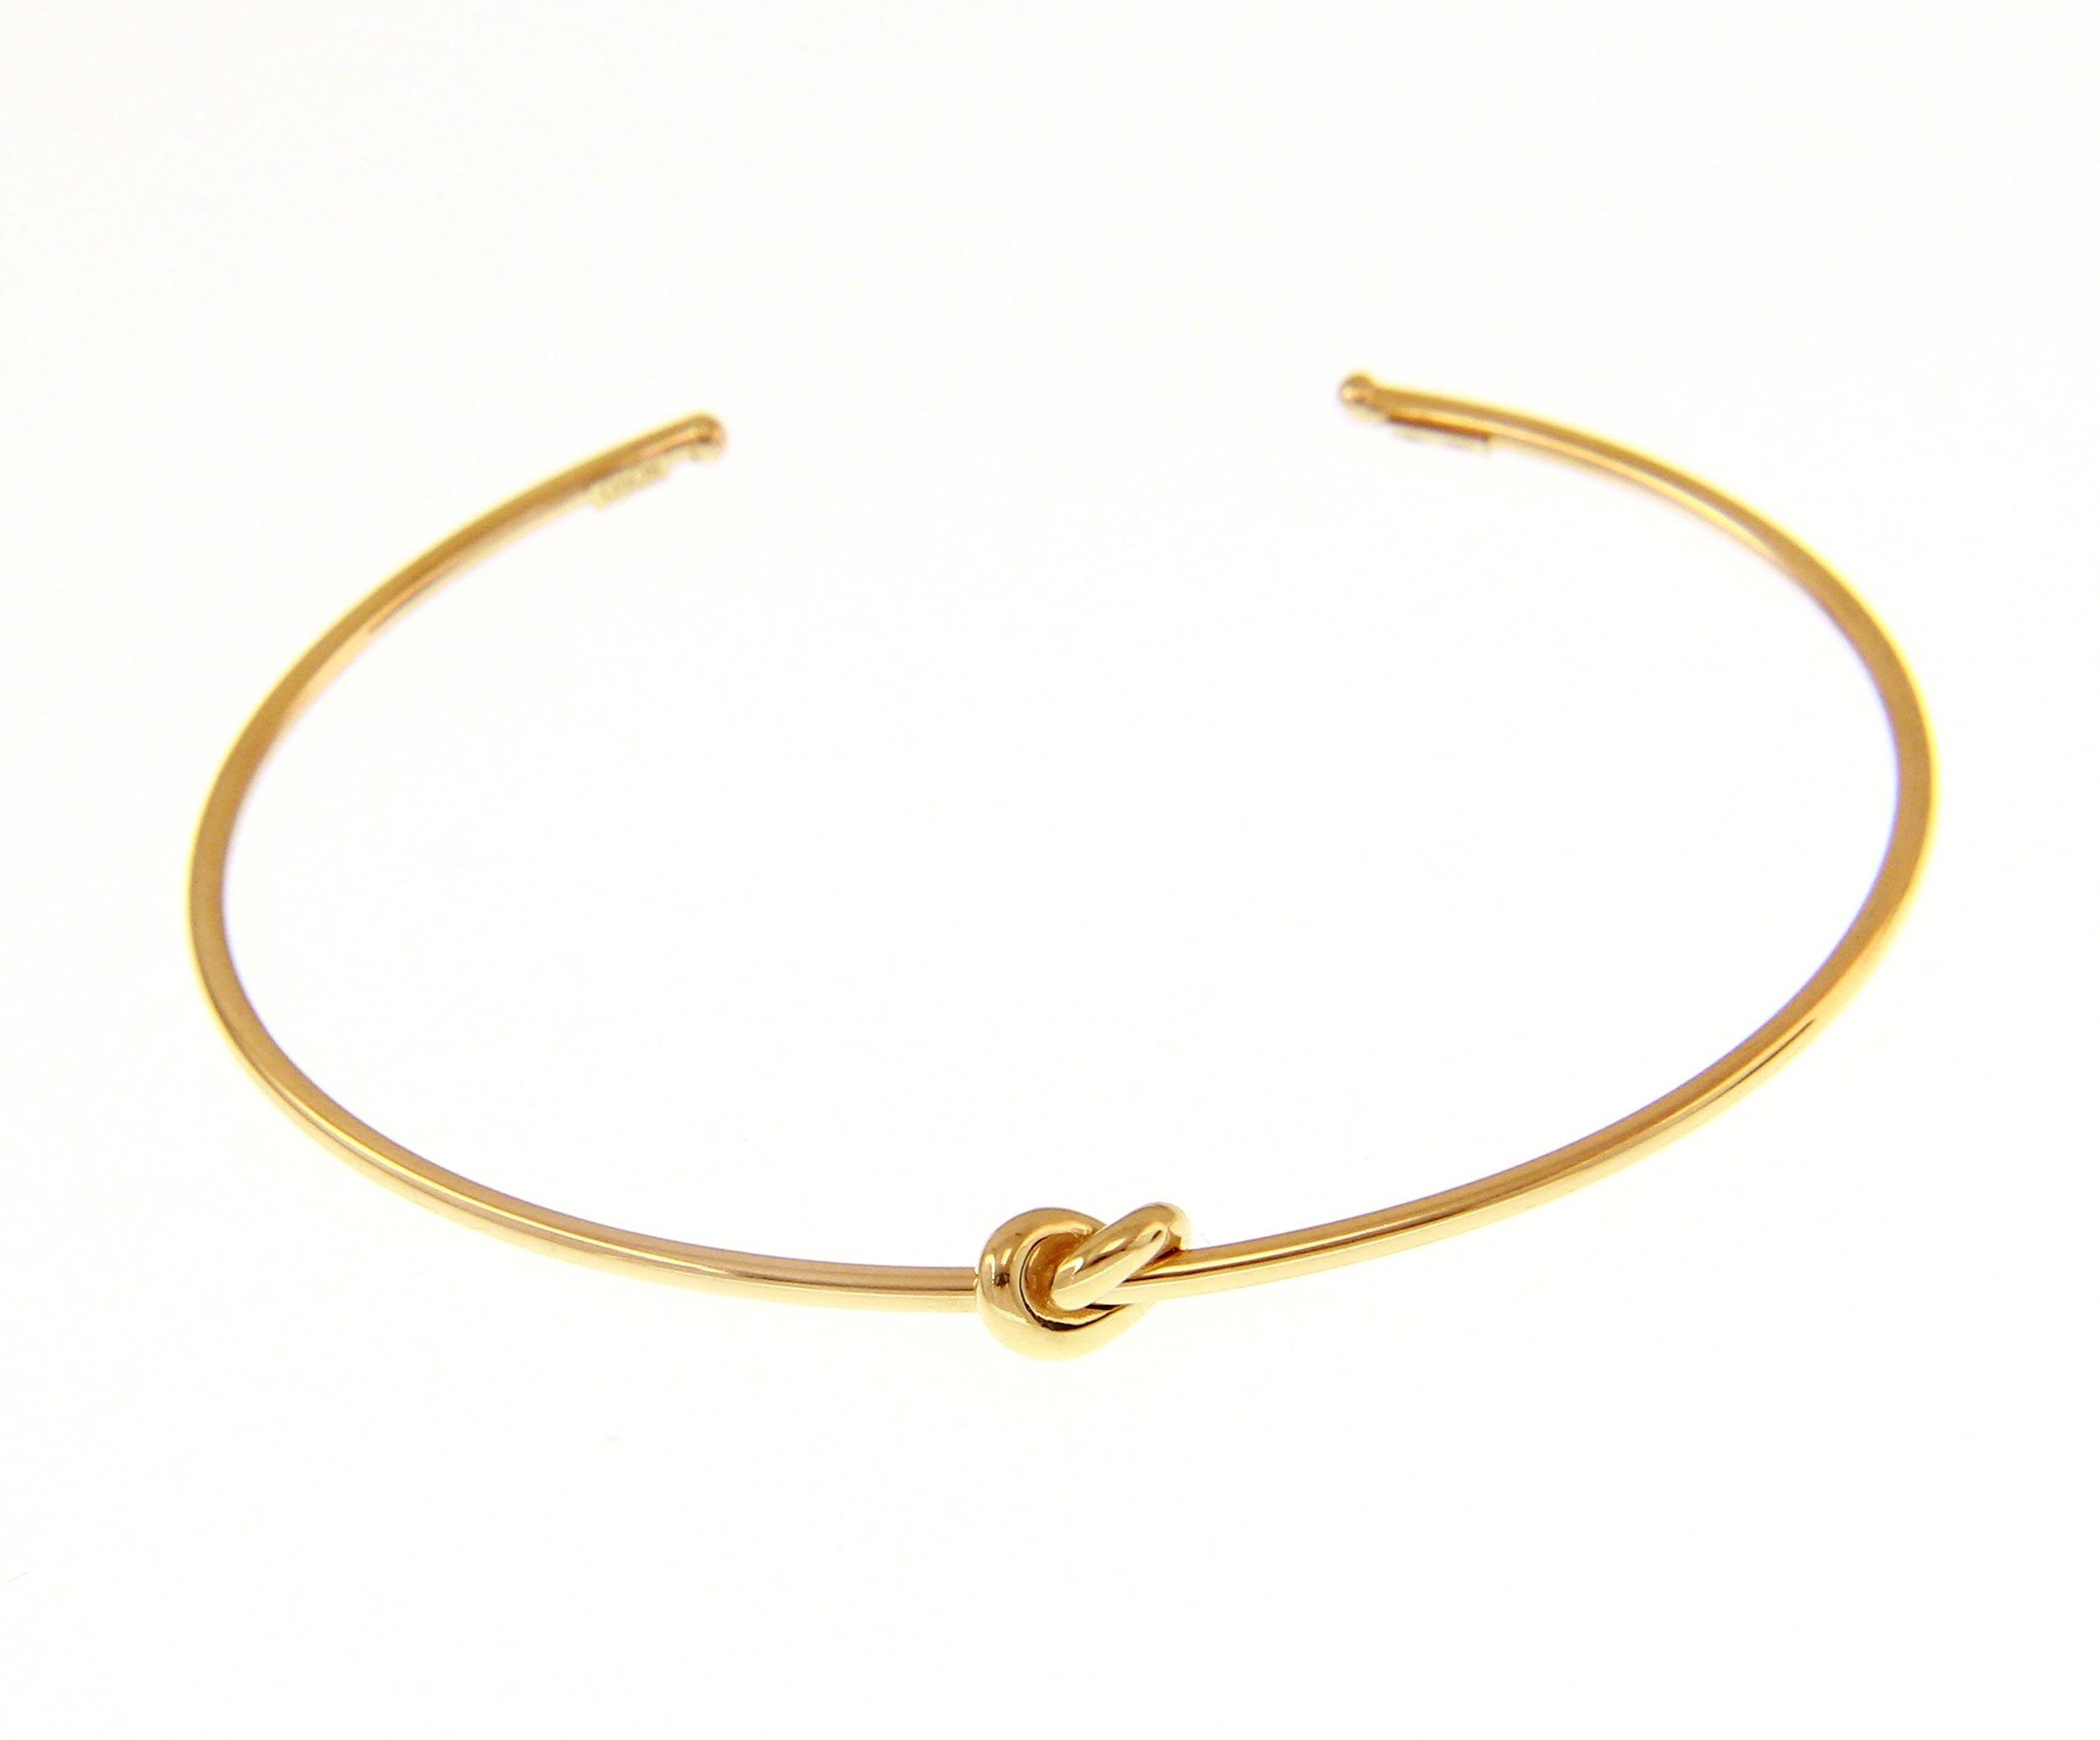 pulsera mujer charms oro - brazalete oro mujer para comprar en joyeria online